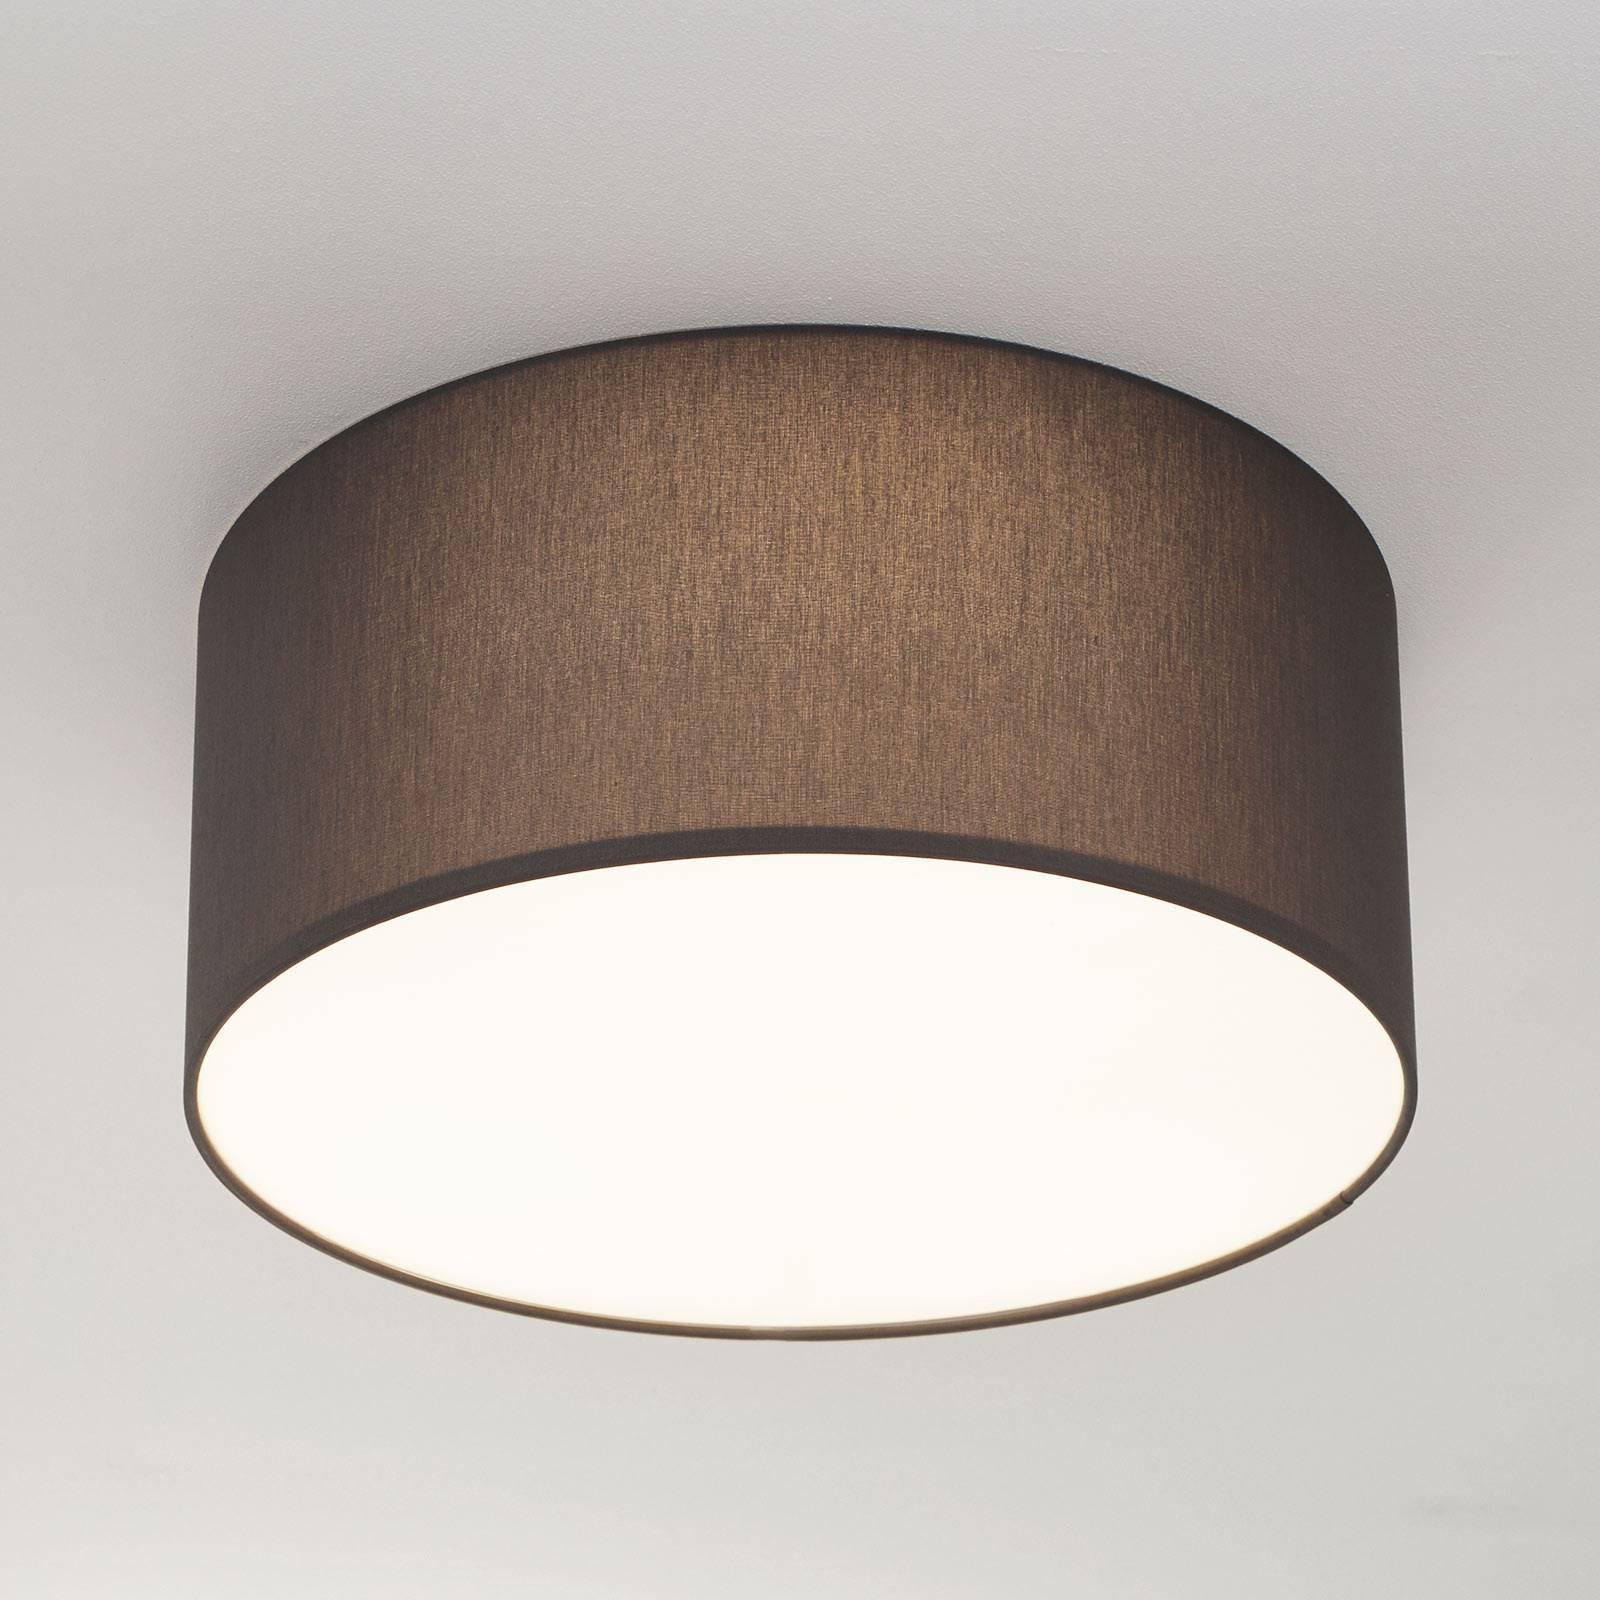 Leisteengrijze plafondlamp Mara, 40 cm